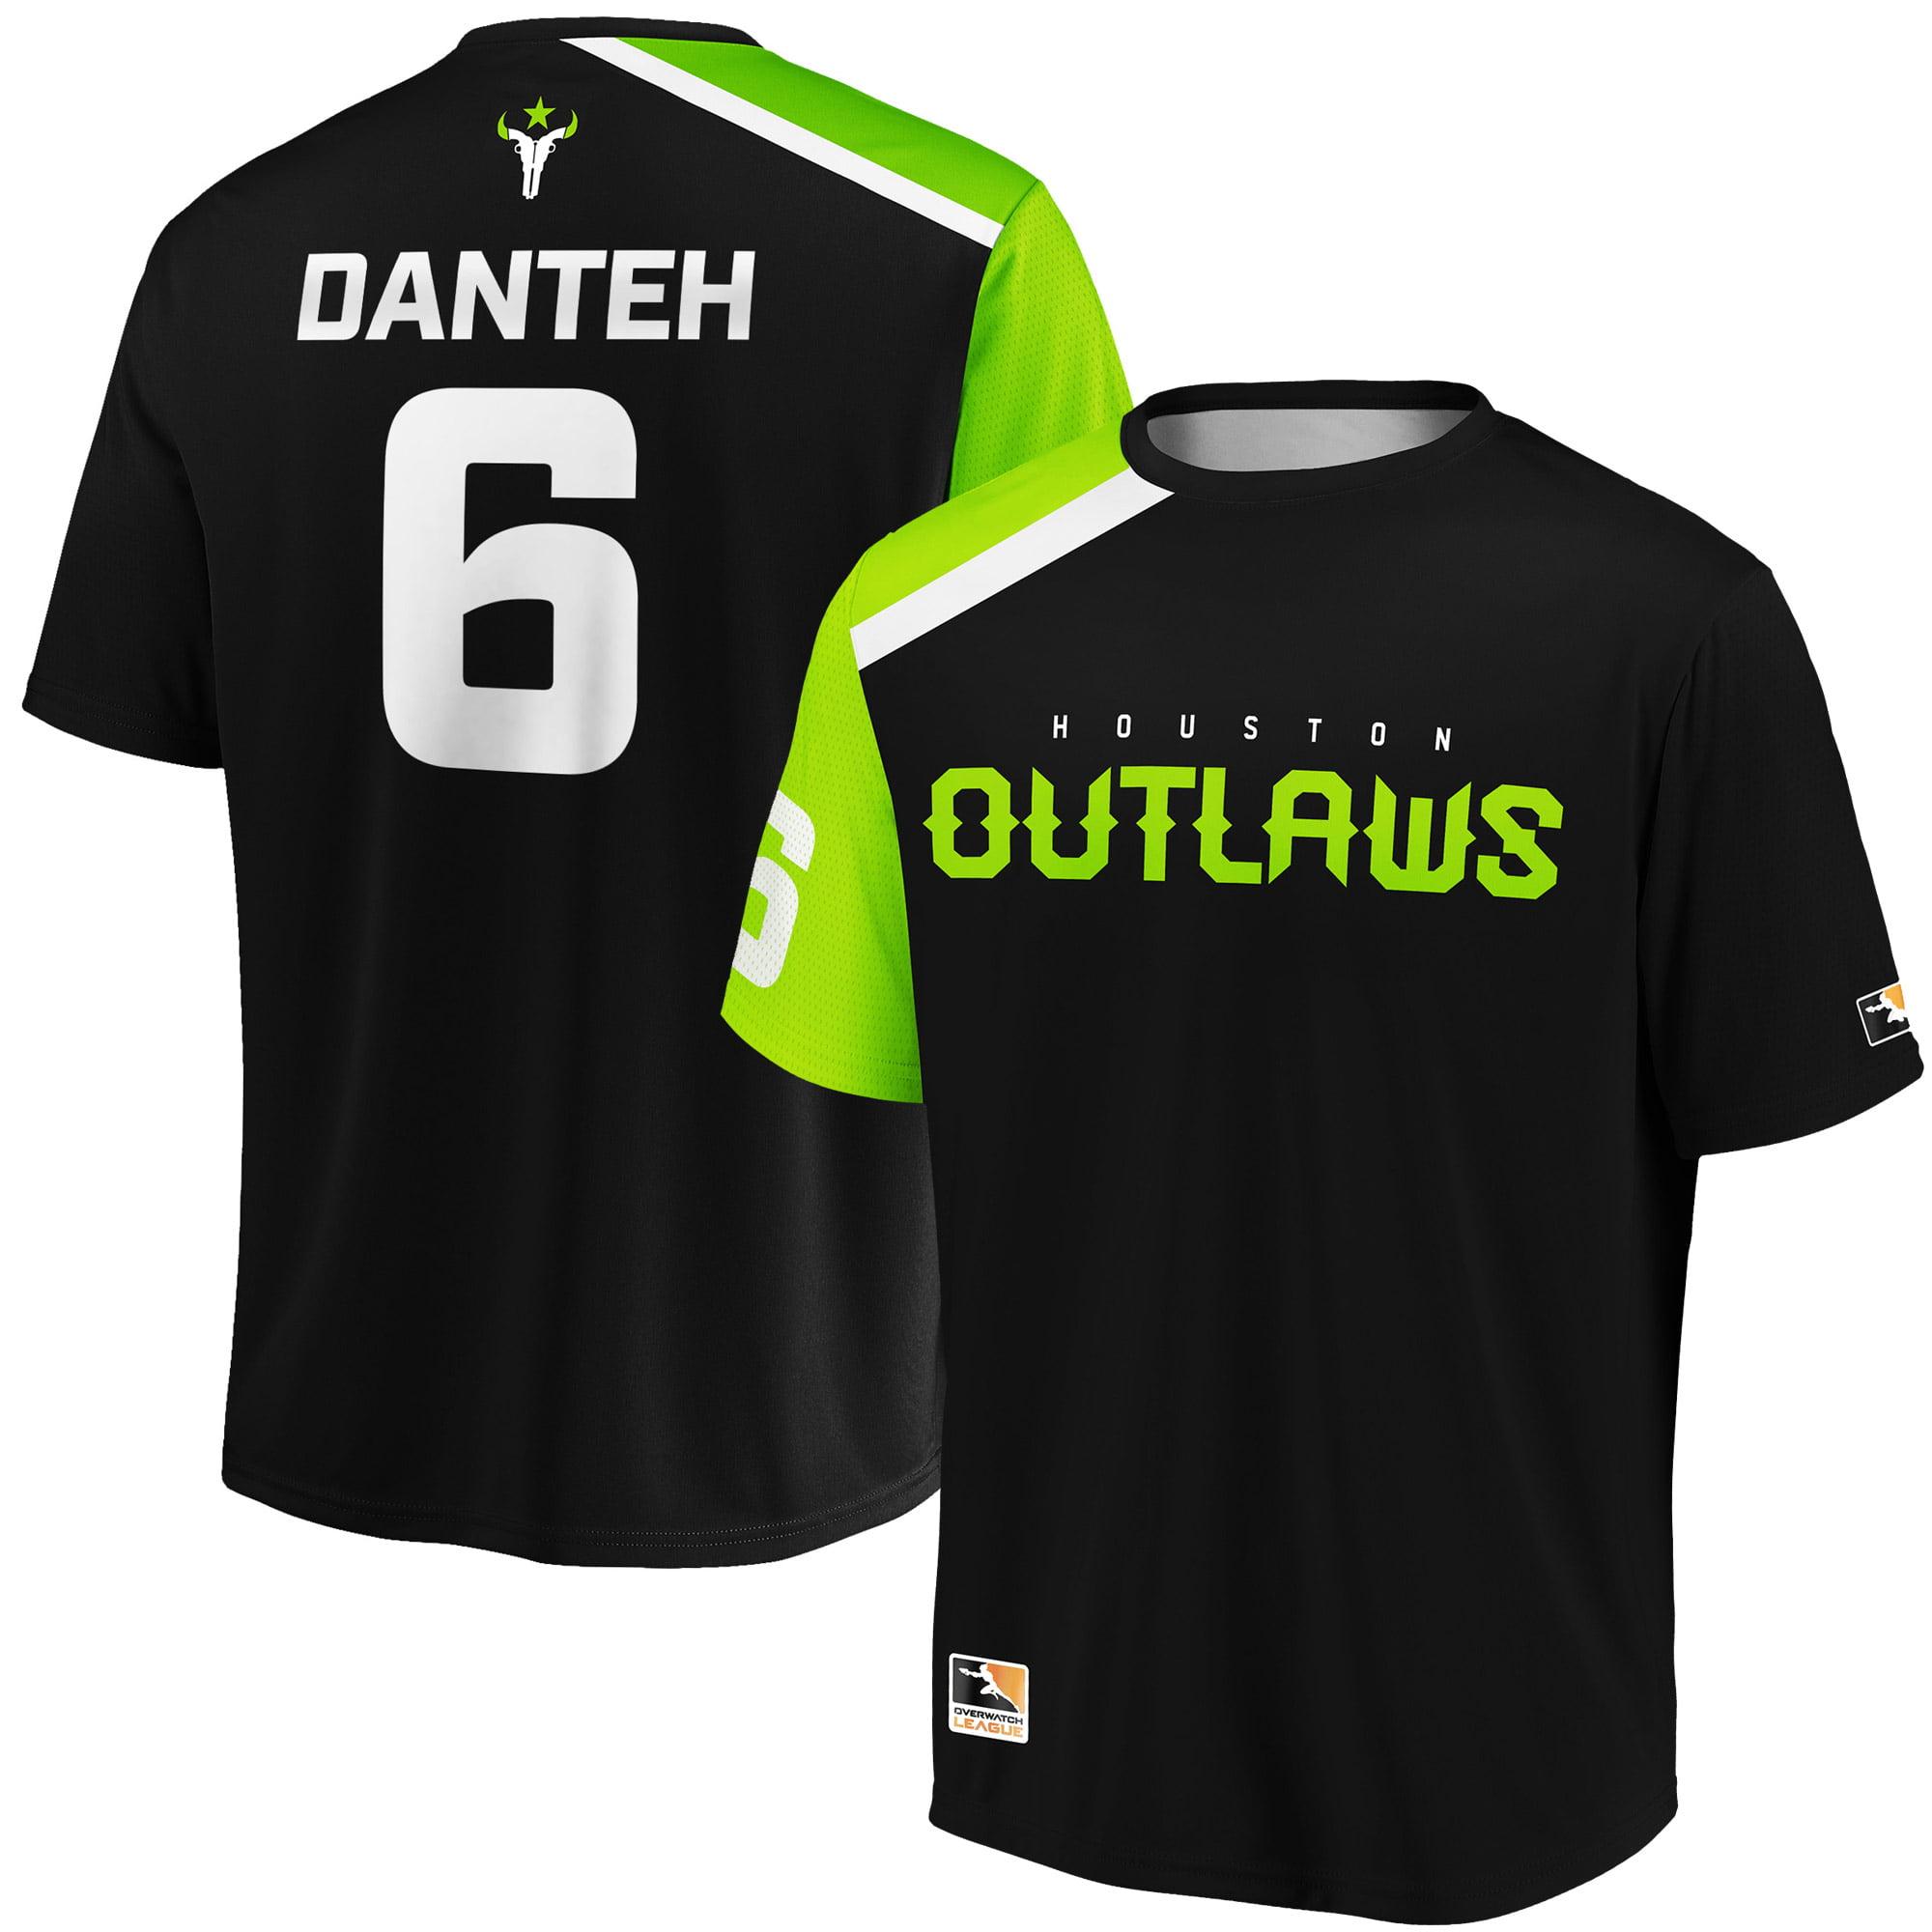 Danteh Houston Outlaws Overwatch League Replica Home Jersey - Black